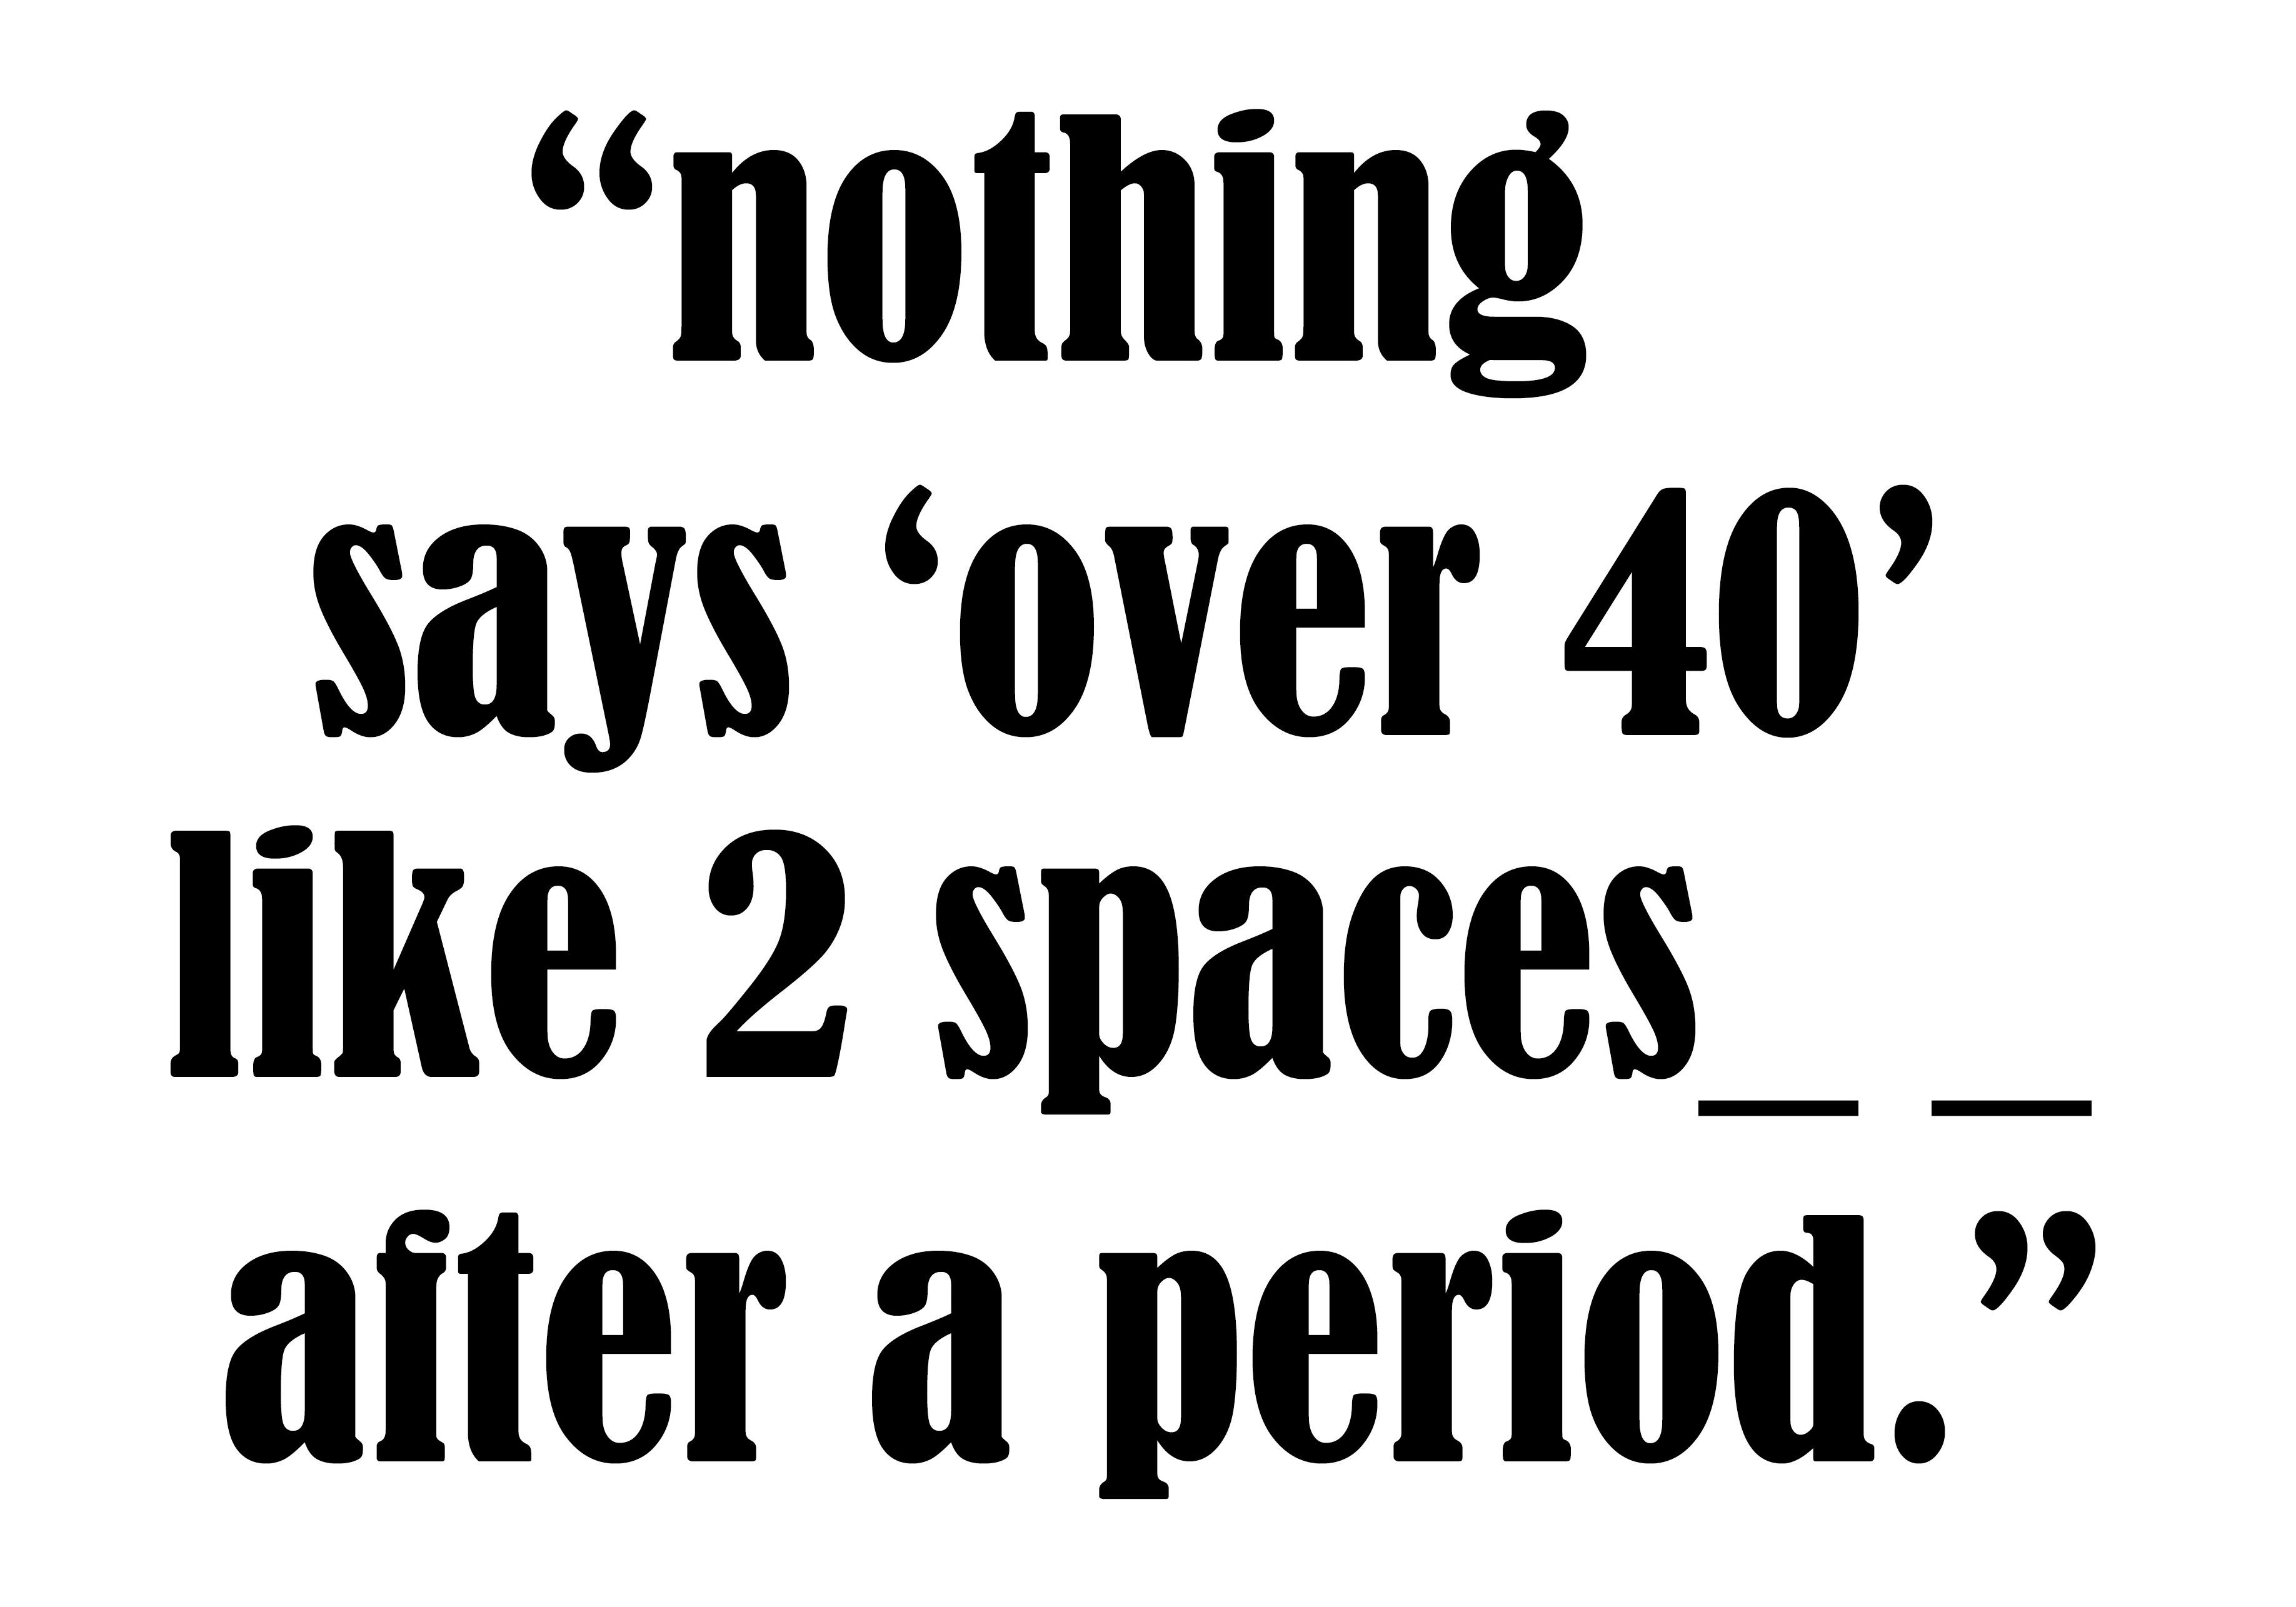 2 spaces